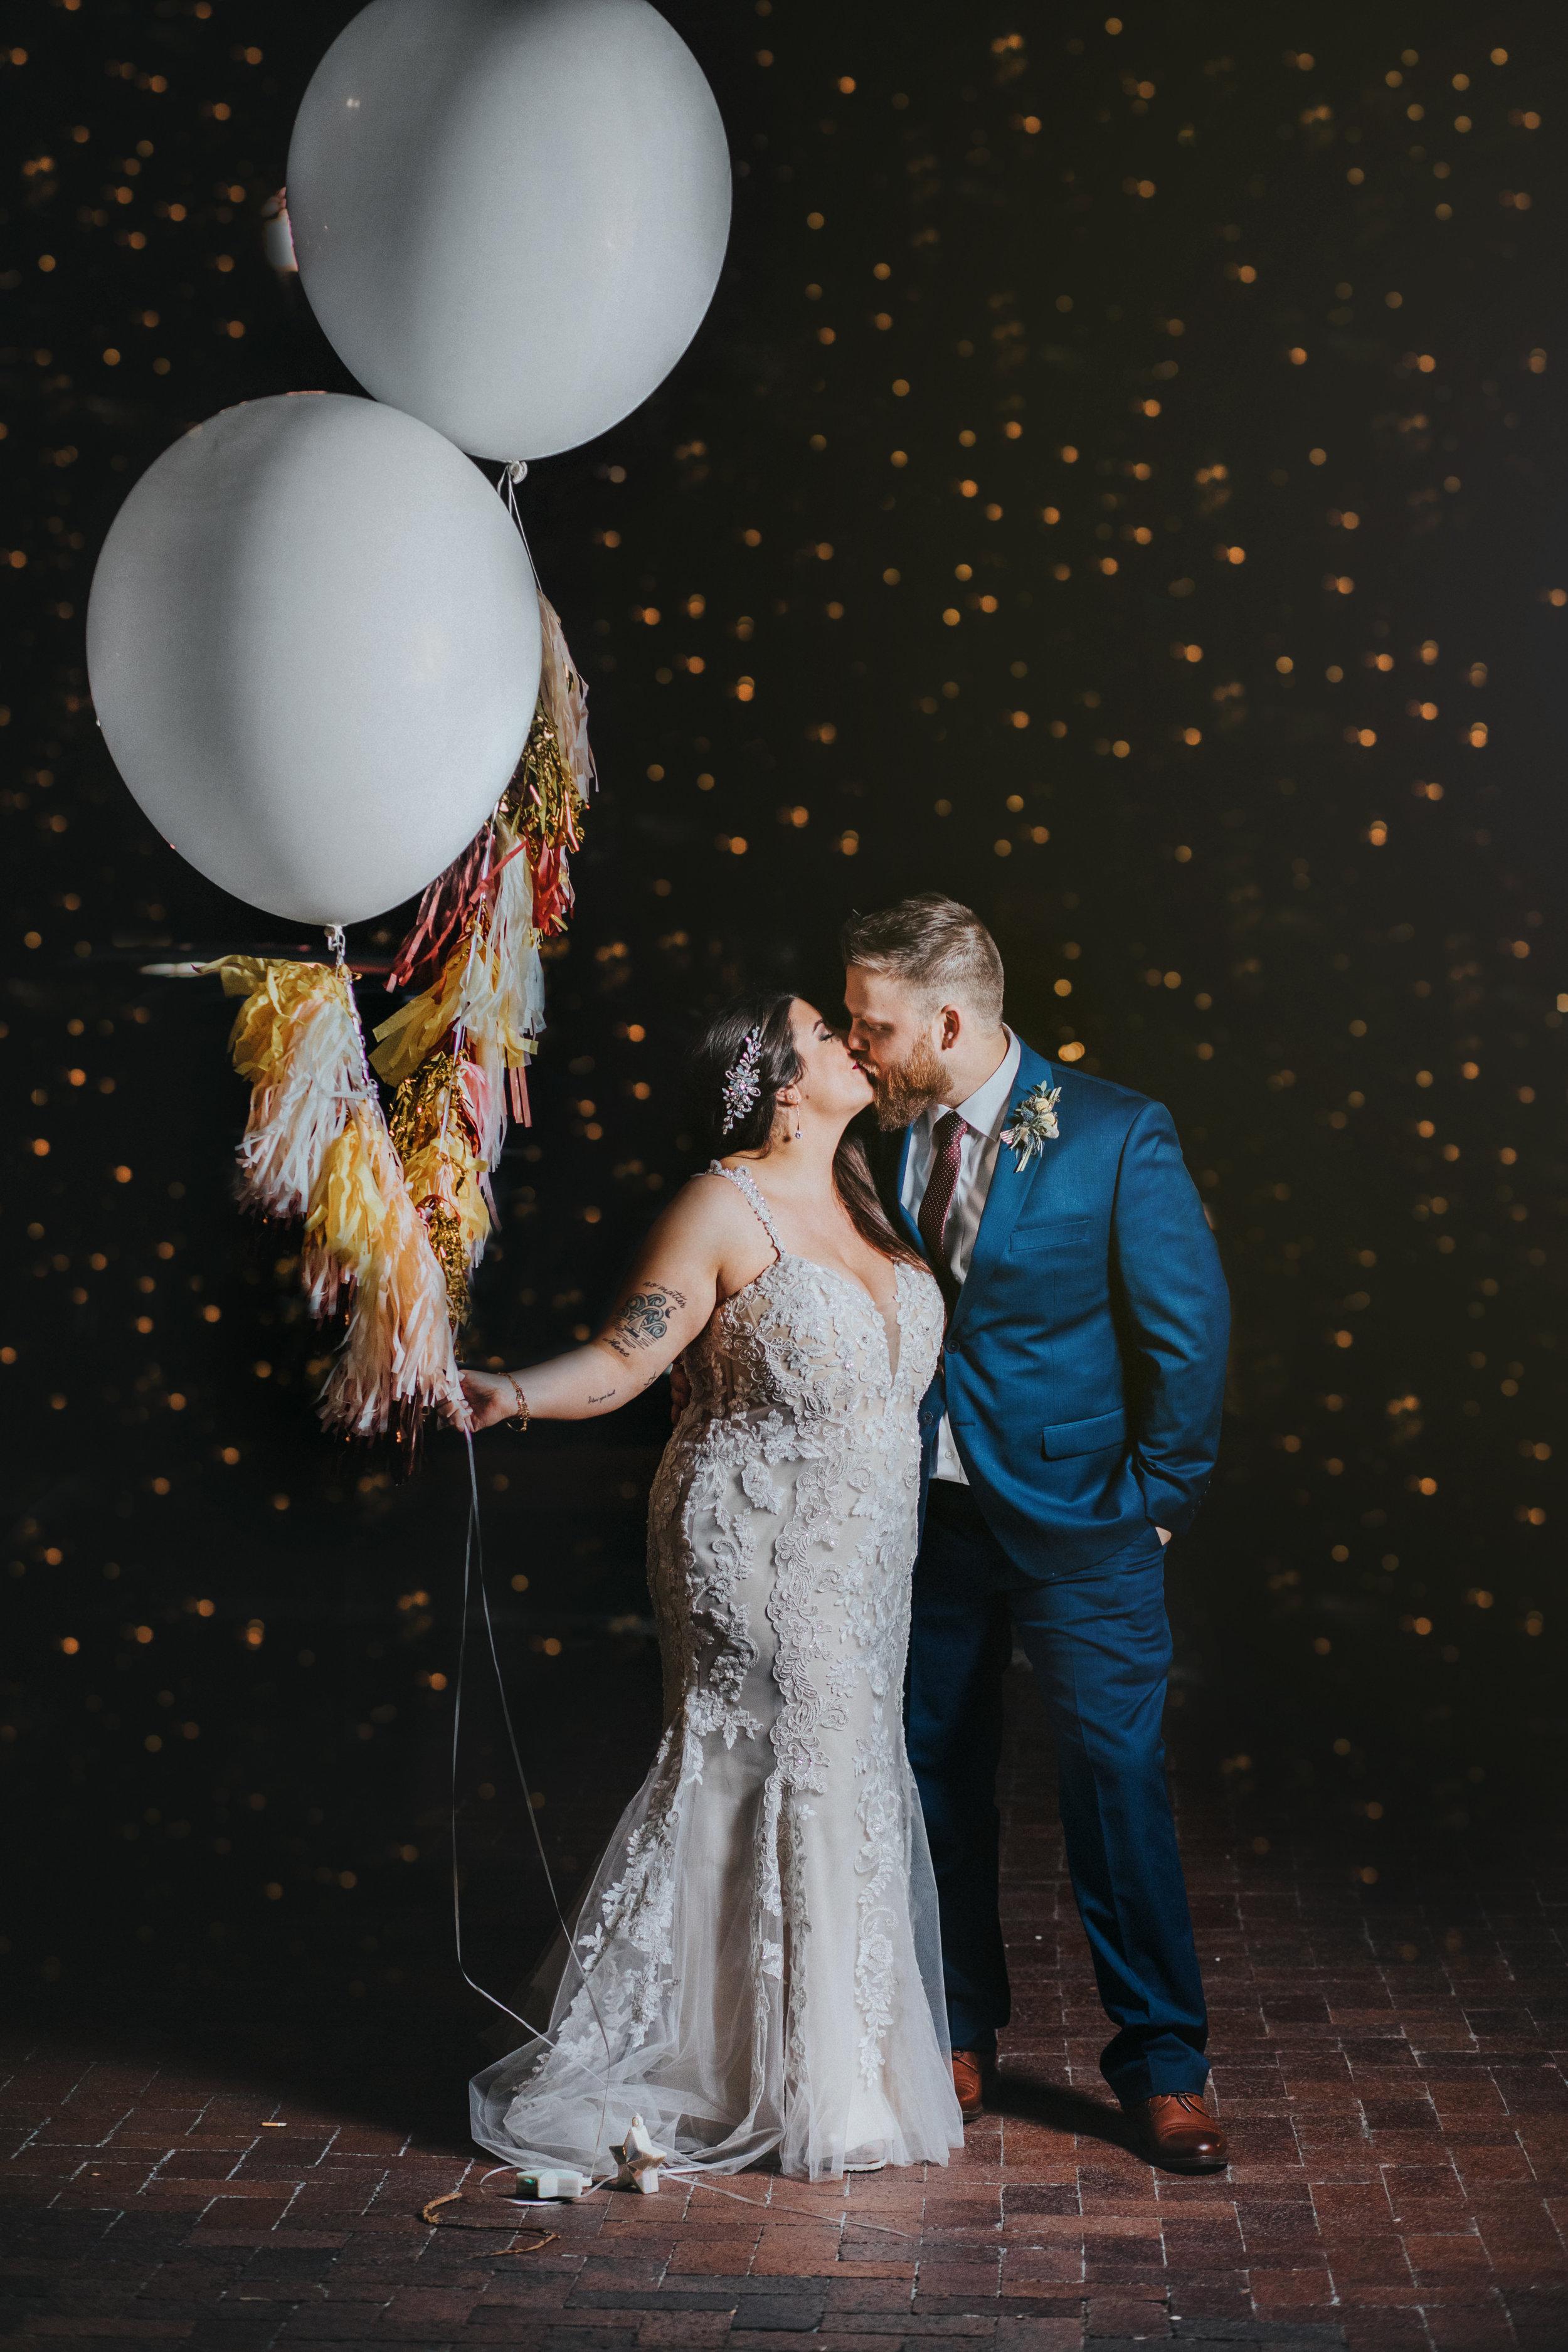 244omaha-old-market-intimate-summer-wedding-tiny-luxe-elopement.jpg